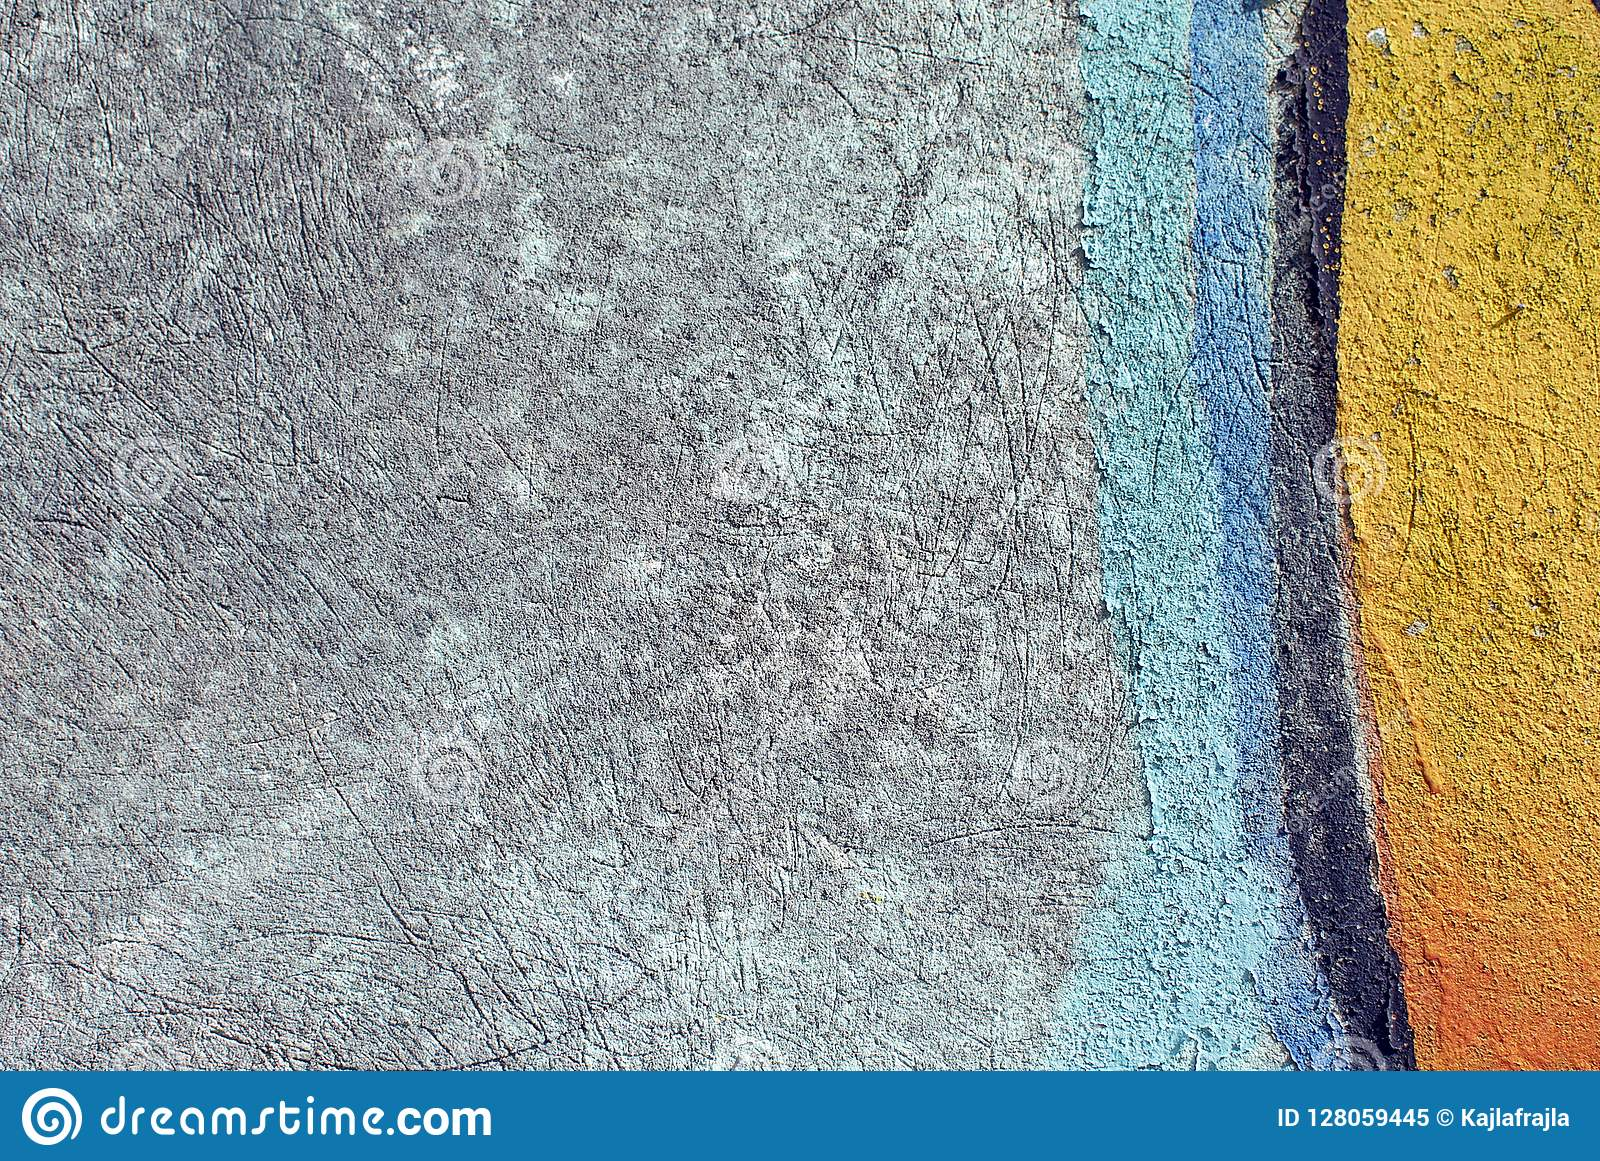 Feche acima da textura da parede do emplastro para fundos e texturas interessantes